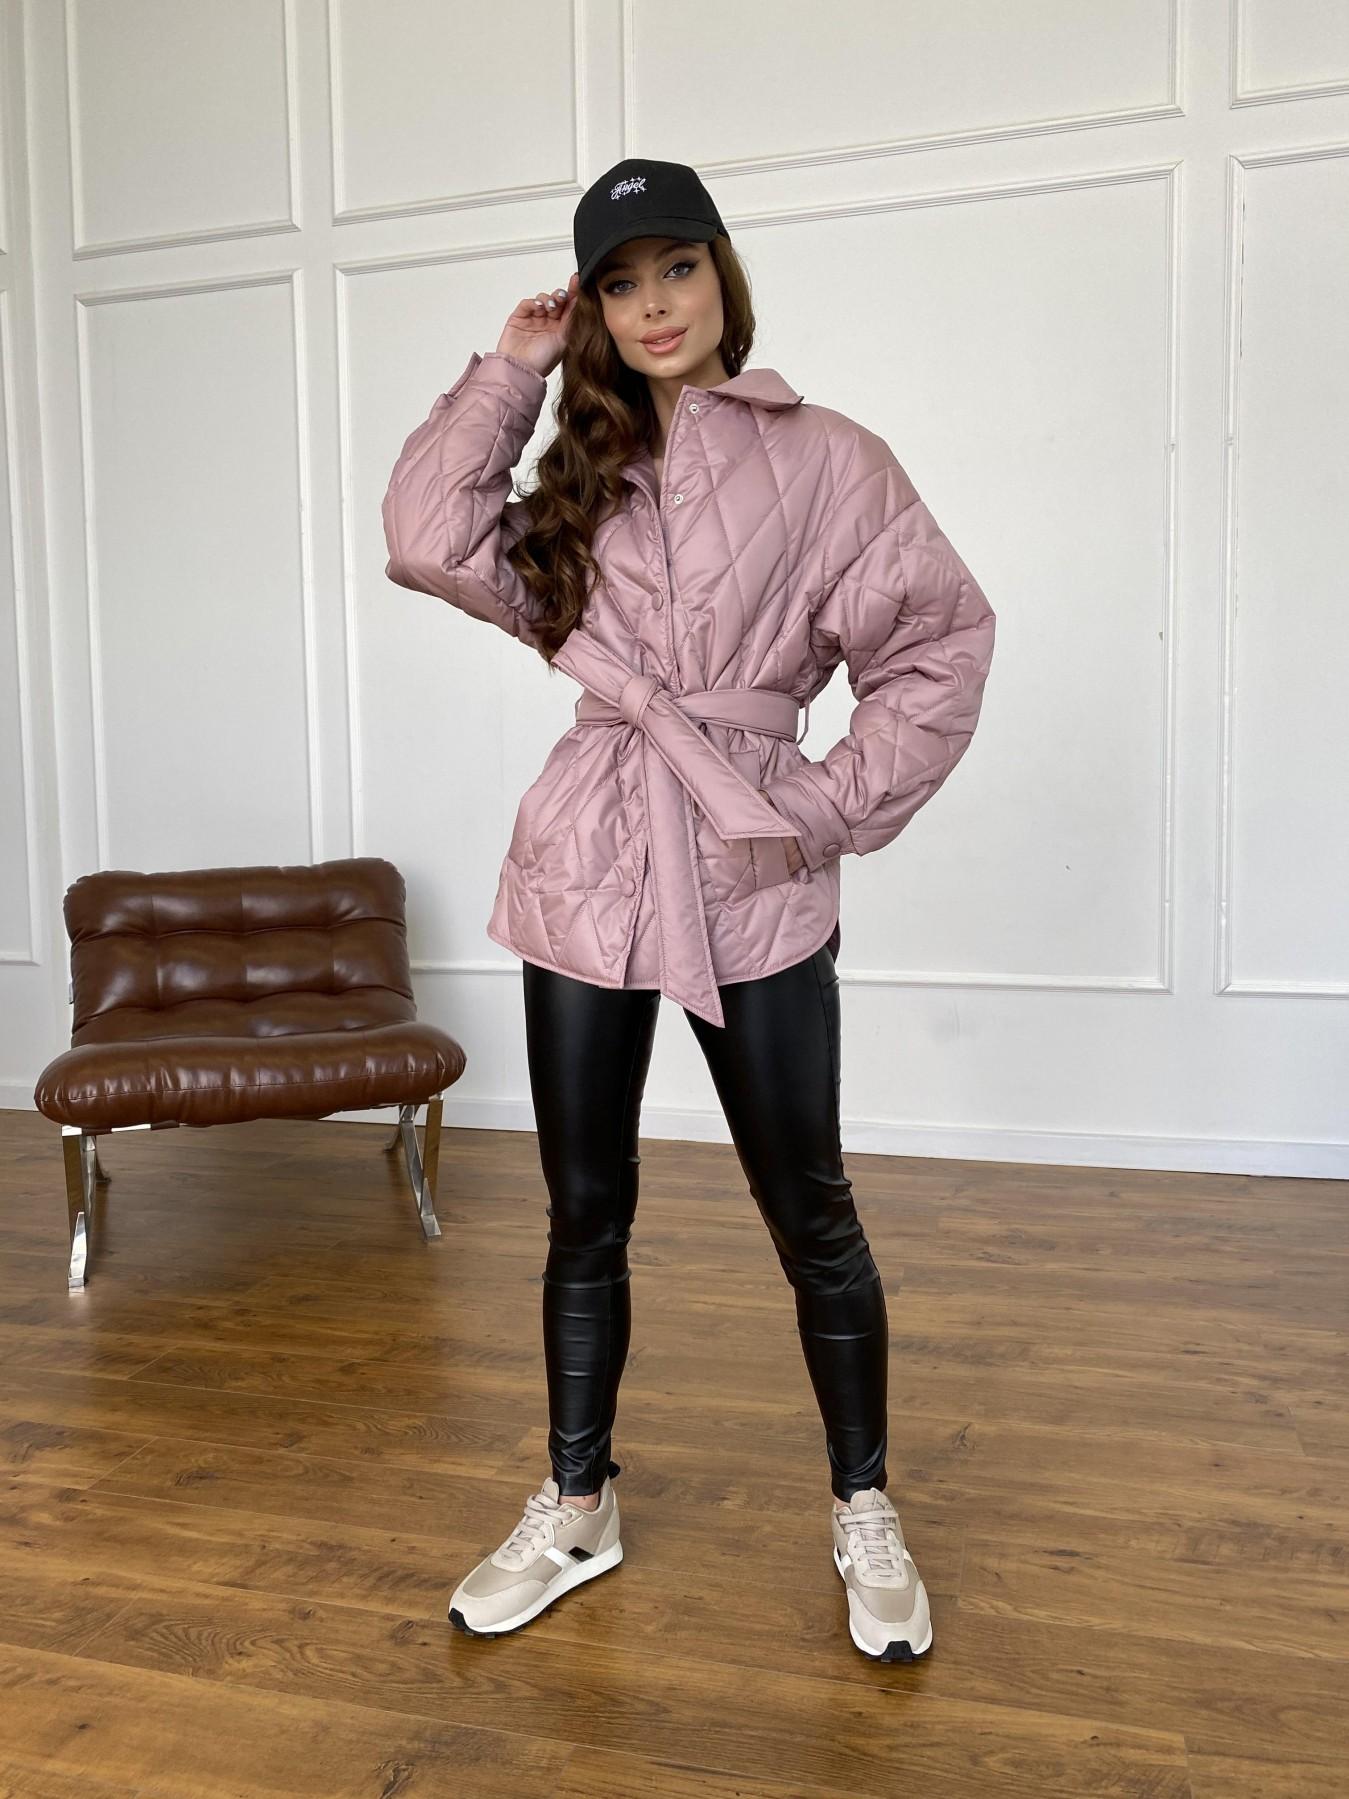 Моно  куртка из плащевой ткани Gloria 11081 АРТ. 47647 Цвет: Пудра - фото 10, интернет магазин tm-modus.ru